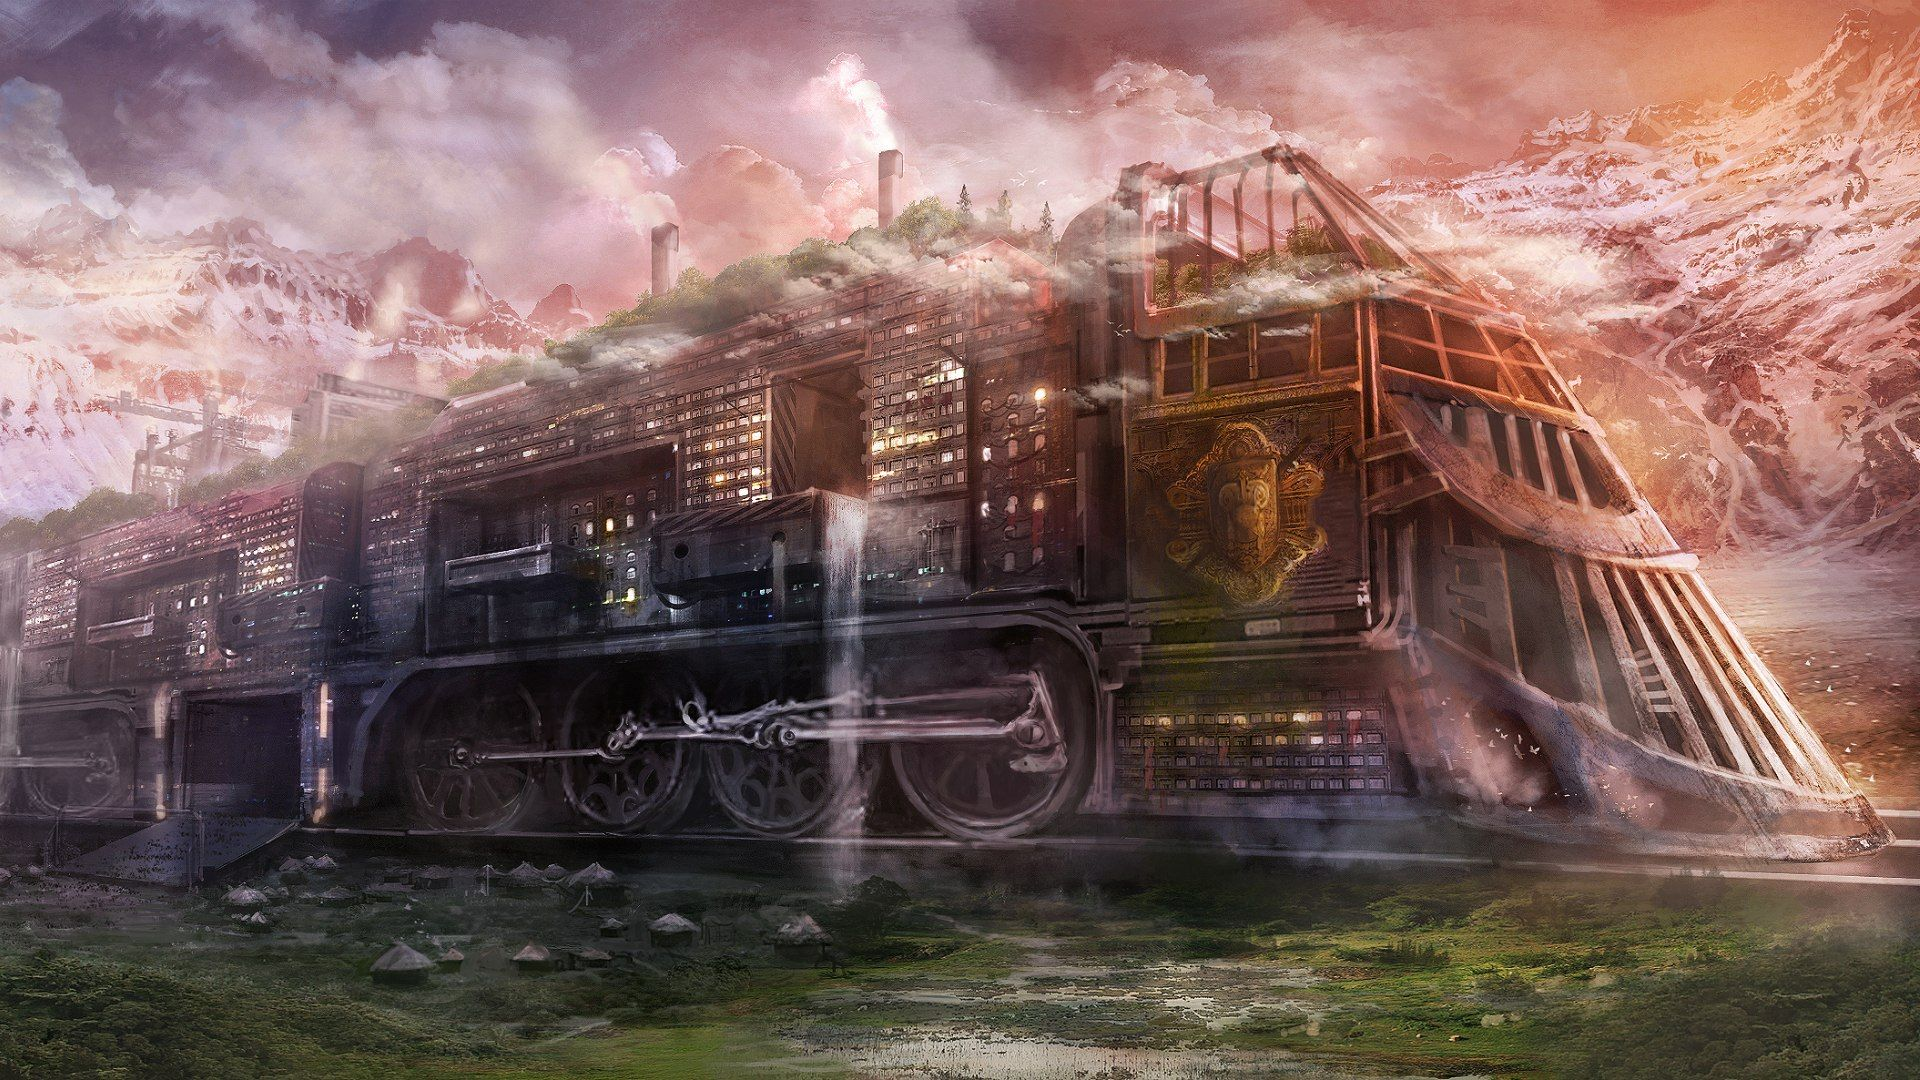 trains artwork Steam Train Art Steam train steampunk sci